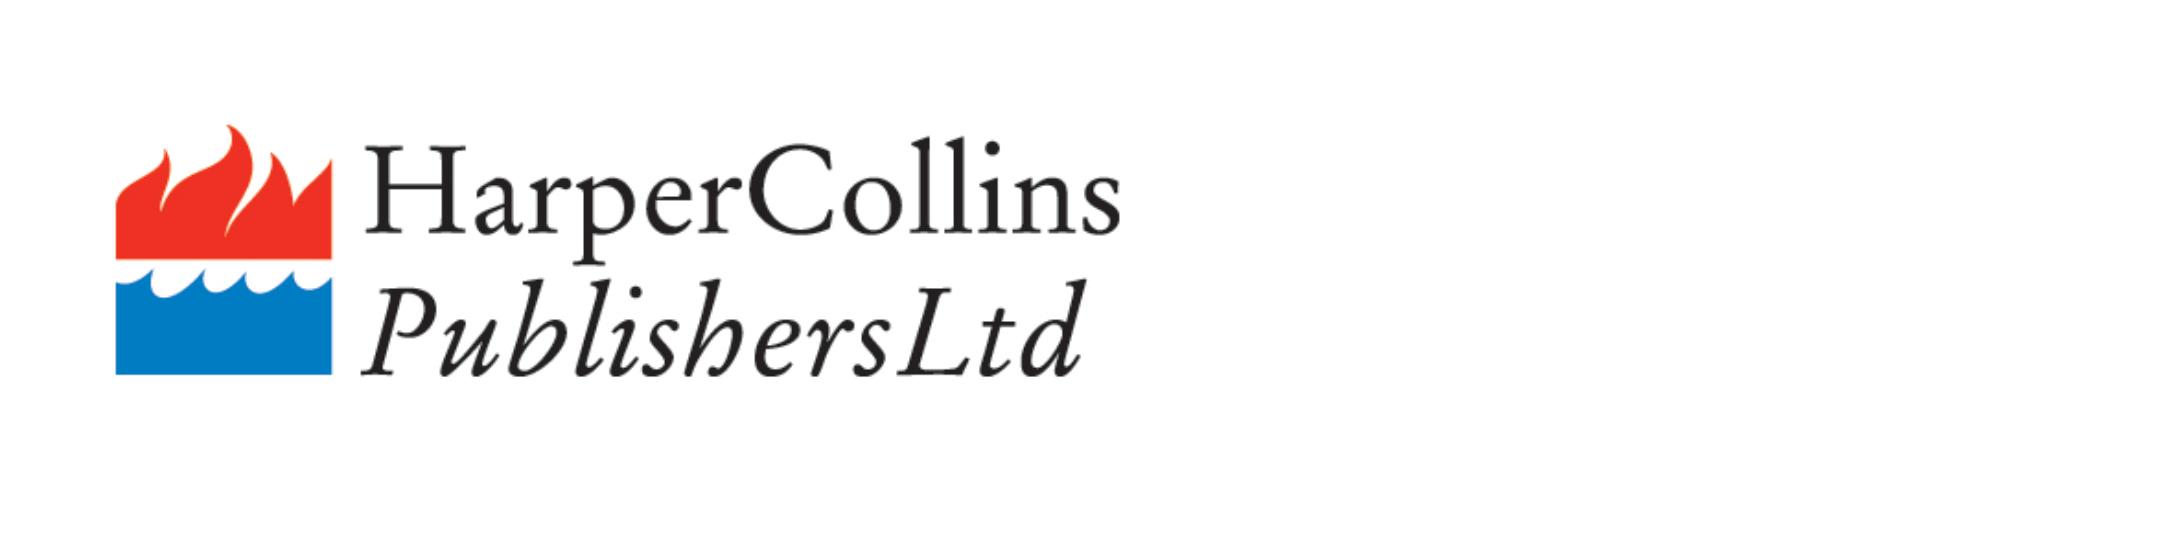 HarperCollins Logo